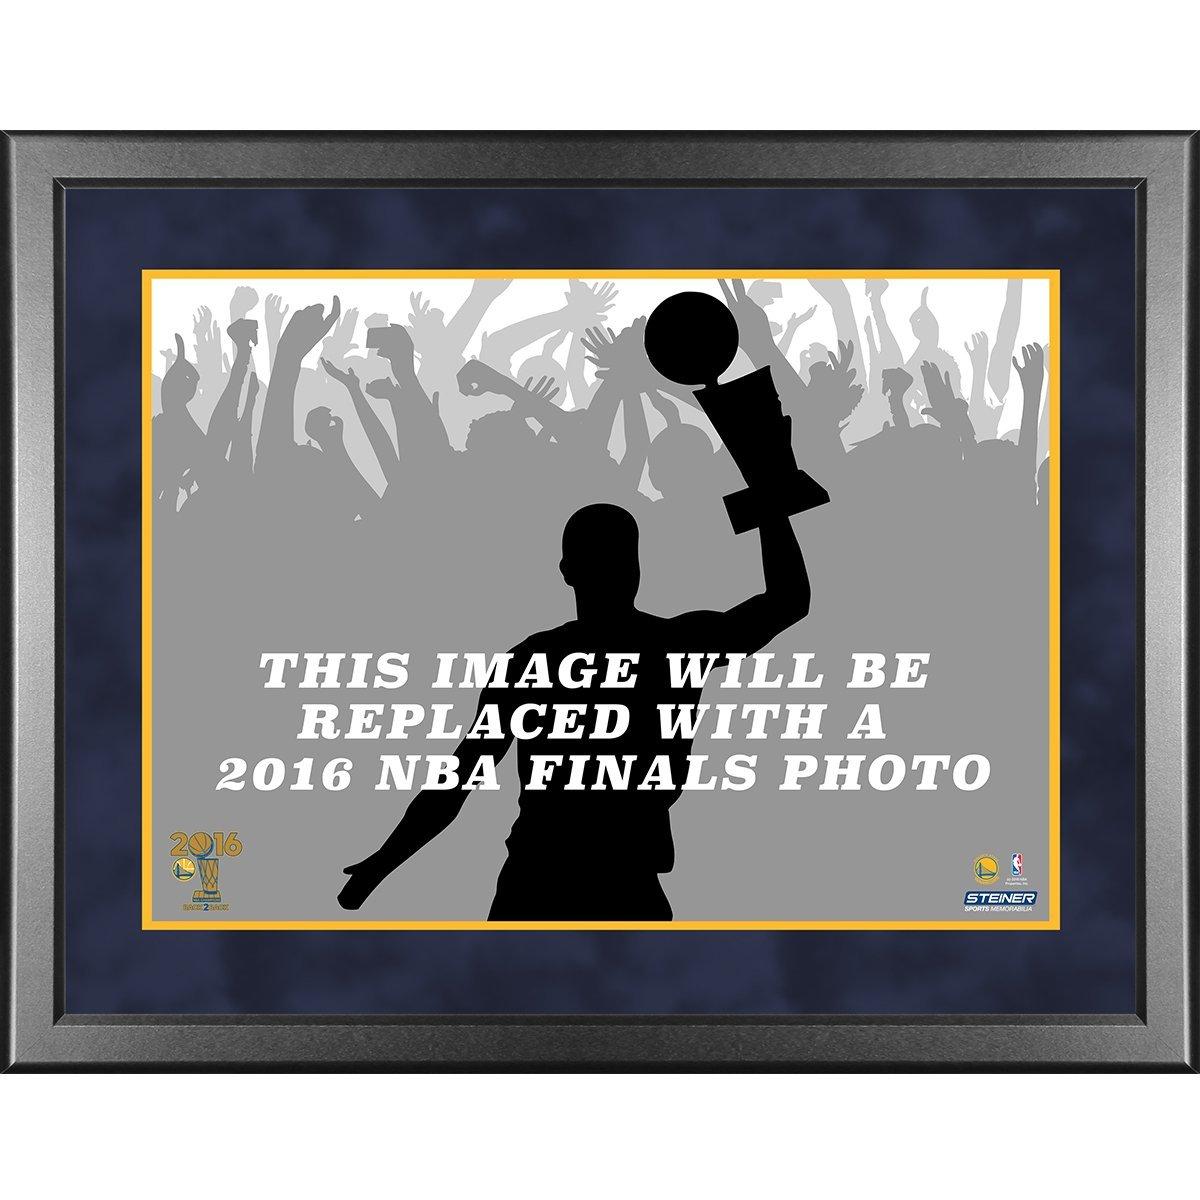 NBA Golden State Warriors Unisex 2016 NBA Champion Golden State Warriors 8x10 Framed Photo, Navy